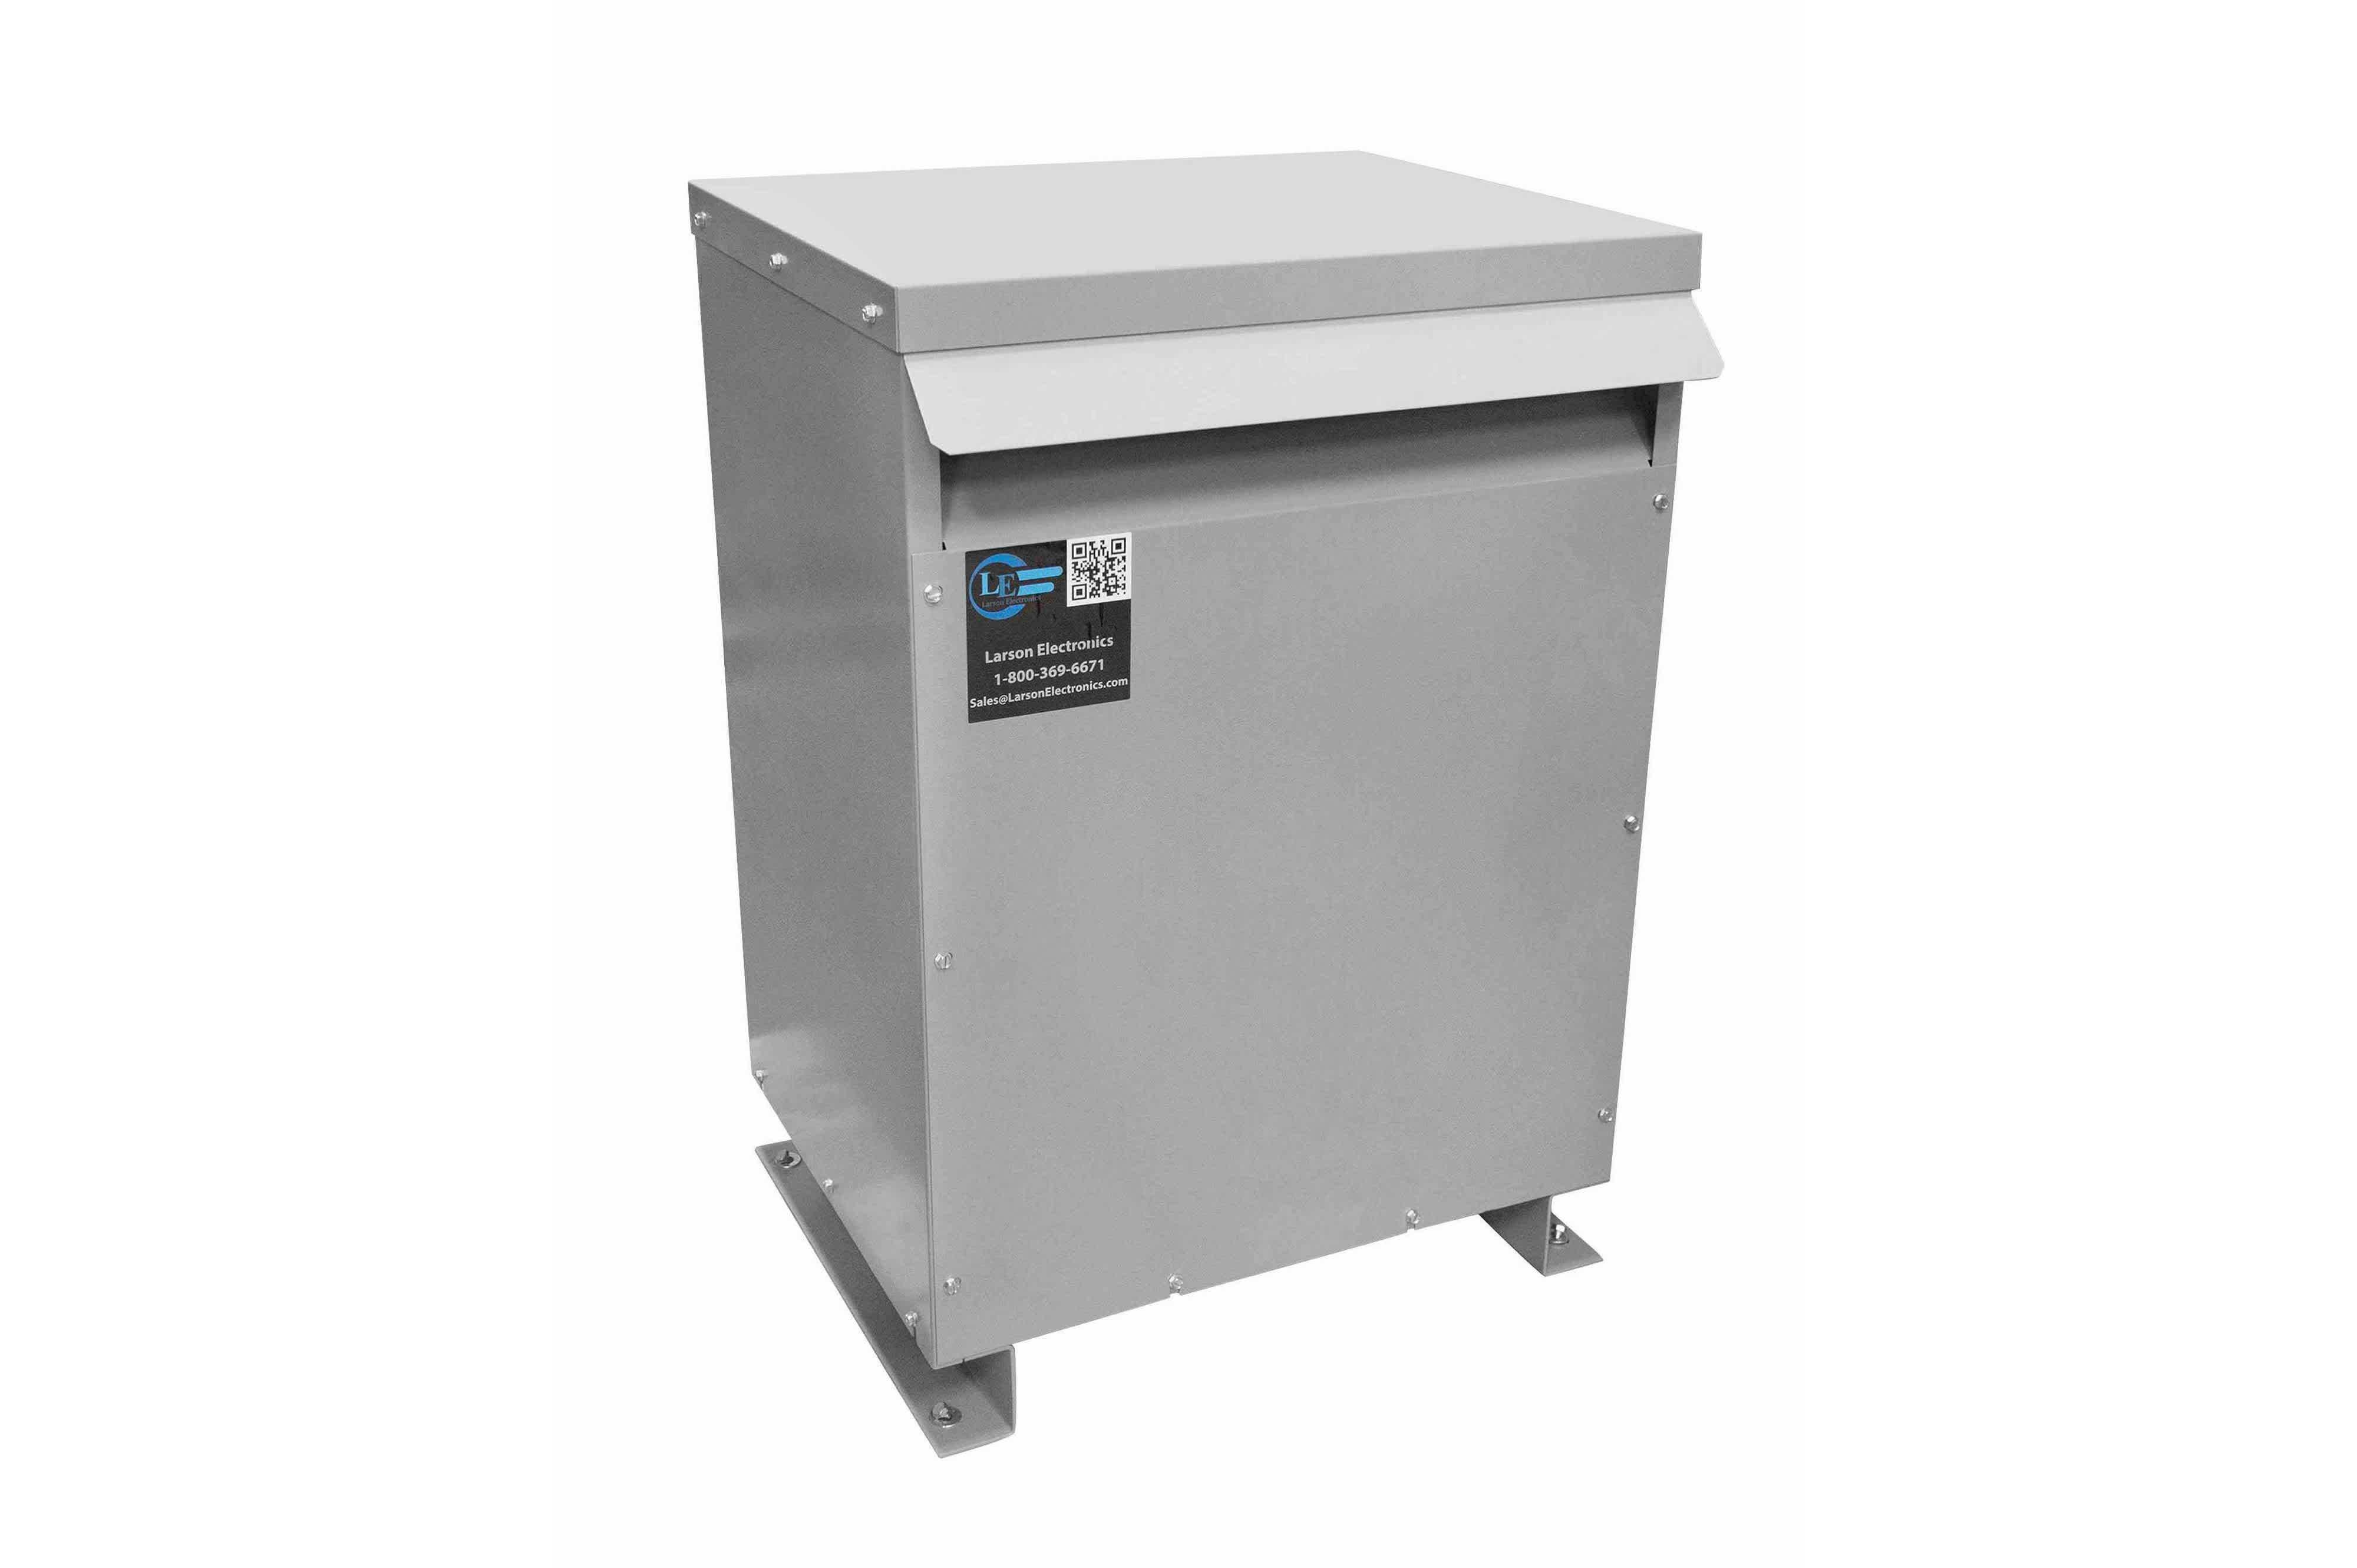 27 kVA 3PH Isolation Transformer, 440V Wye Primary, 208V Delta Secondary, N3R, Ventilated, 60 Hz